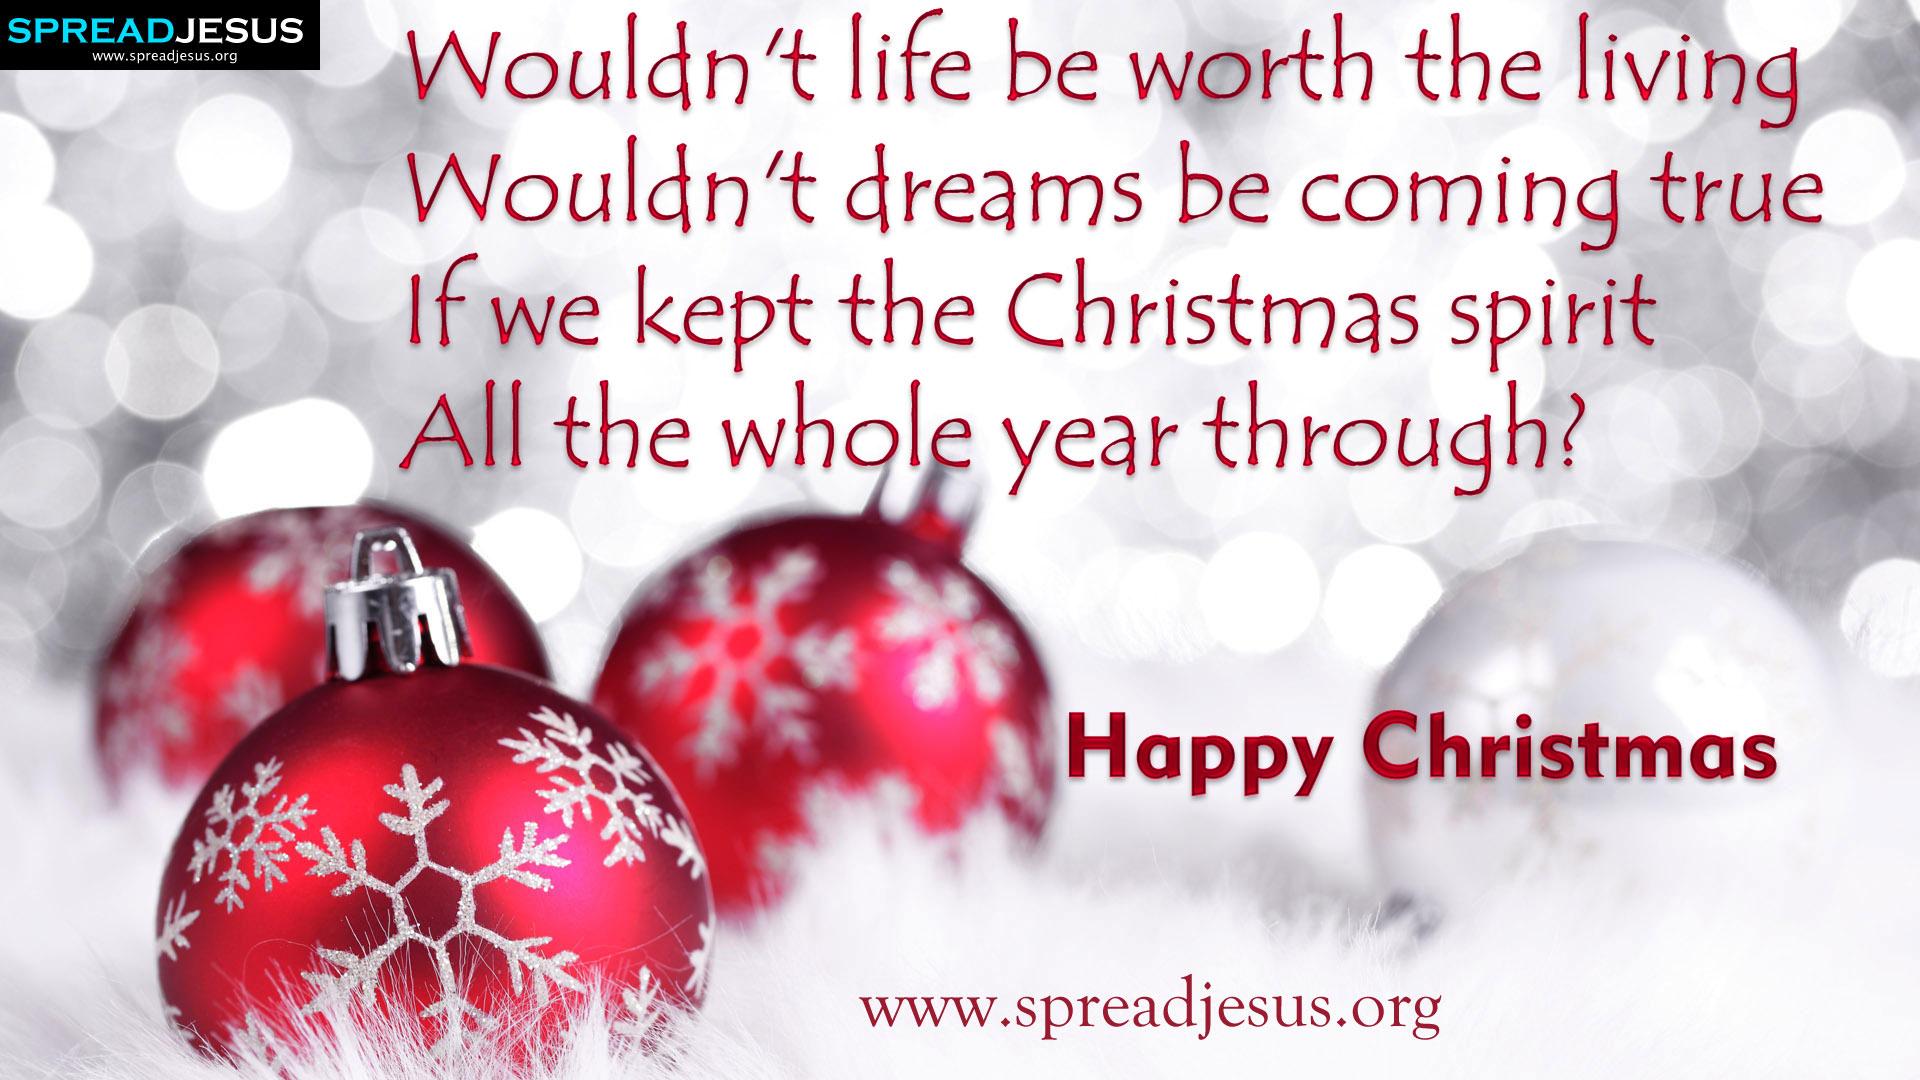 Happy Christmas:Christmas greatings HD wallpapers: Happy christmas Quotes wallpapers-spreadjesus.org